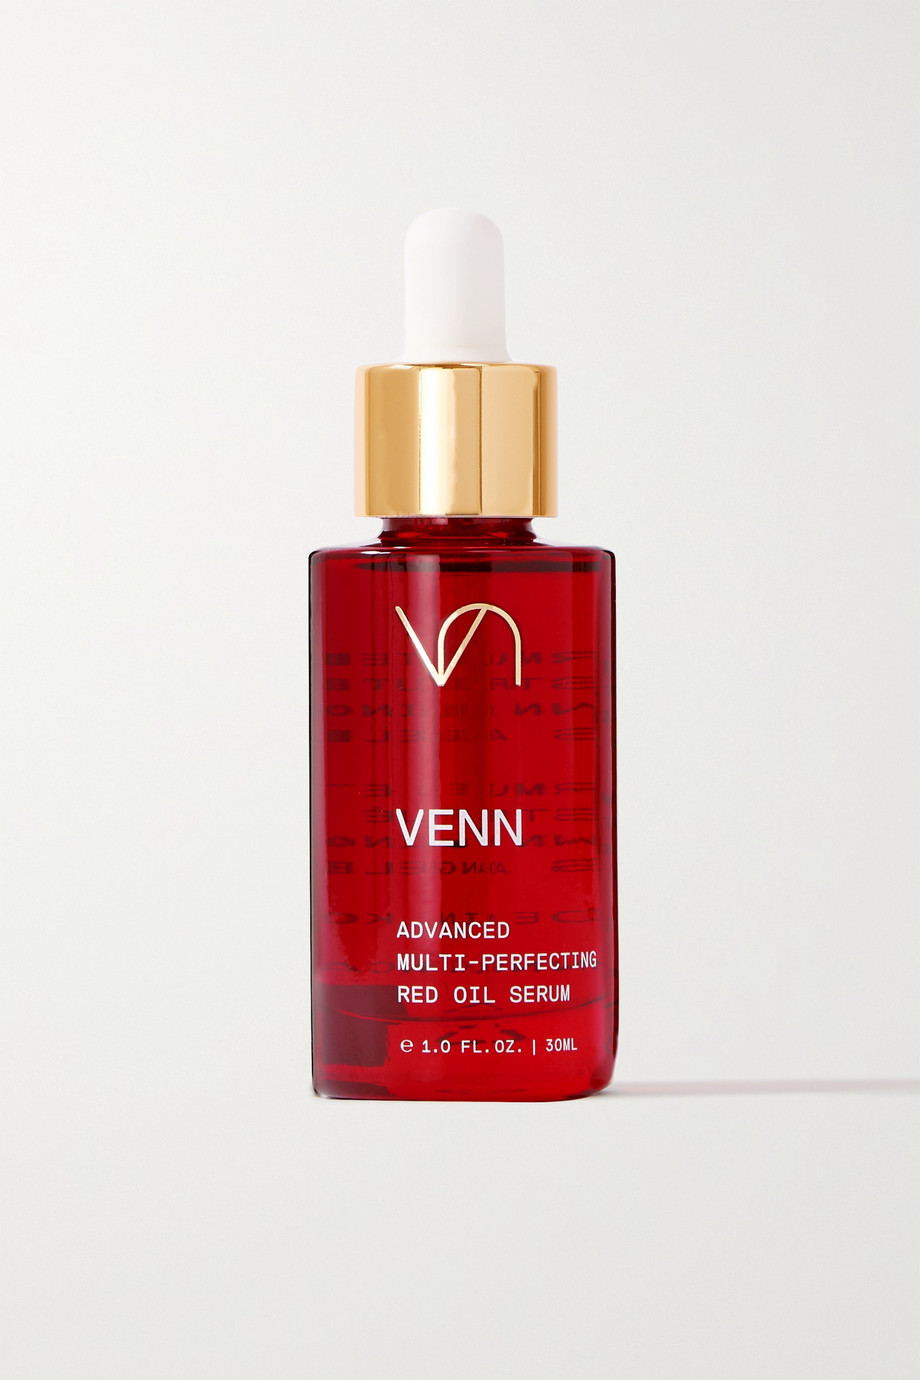 VENN Advanced Multi-Perfecting Red Oil Serum, 30ml